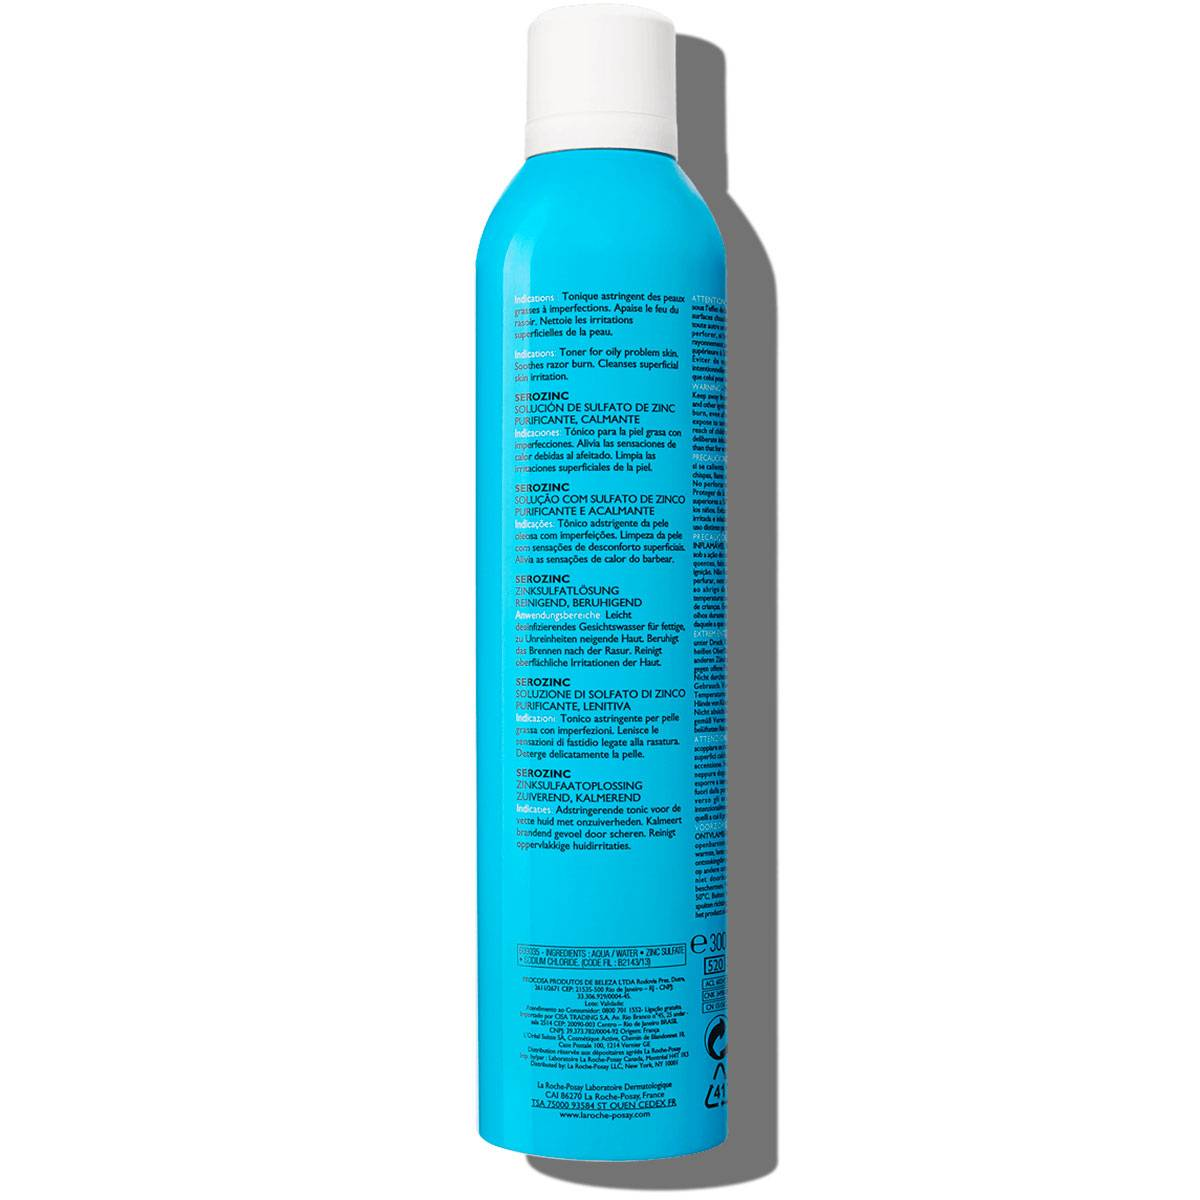 La Roche Posay ProduktSide Serozinc Spray Sink 300ml 3337875565783 Bak